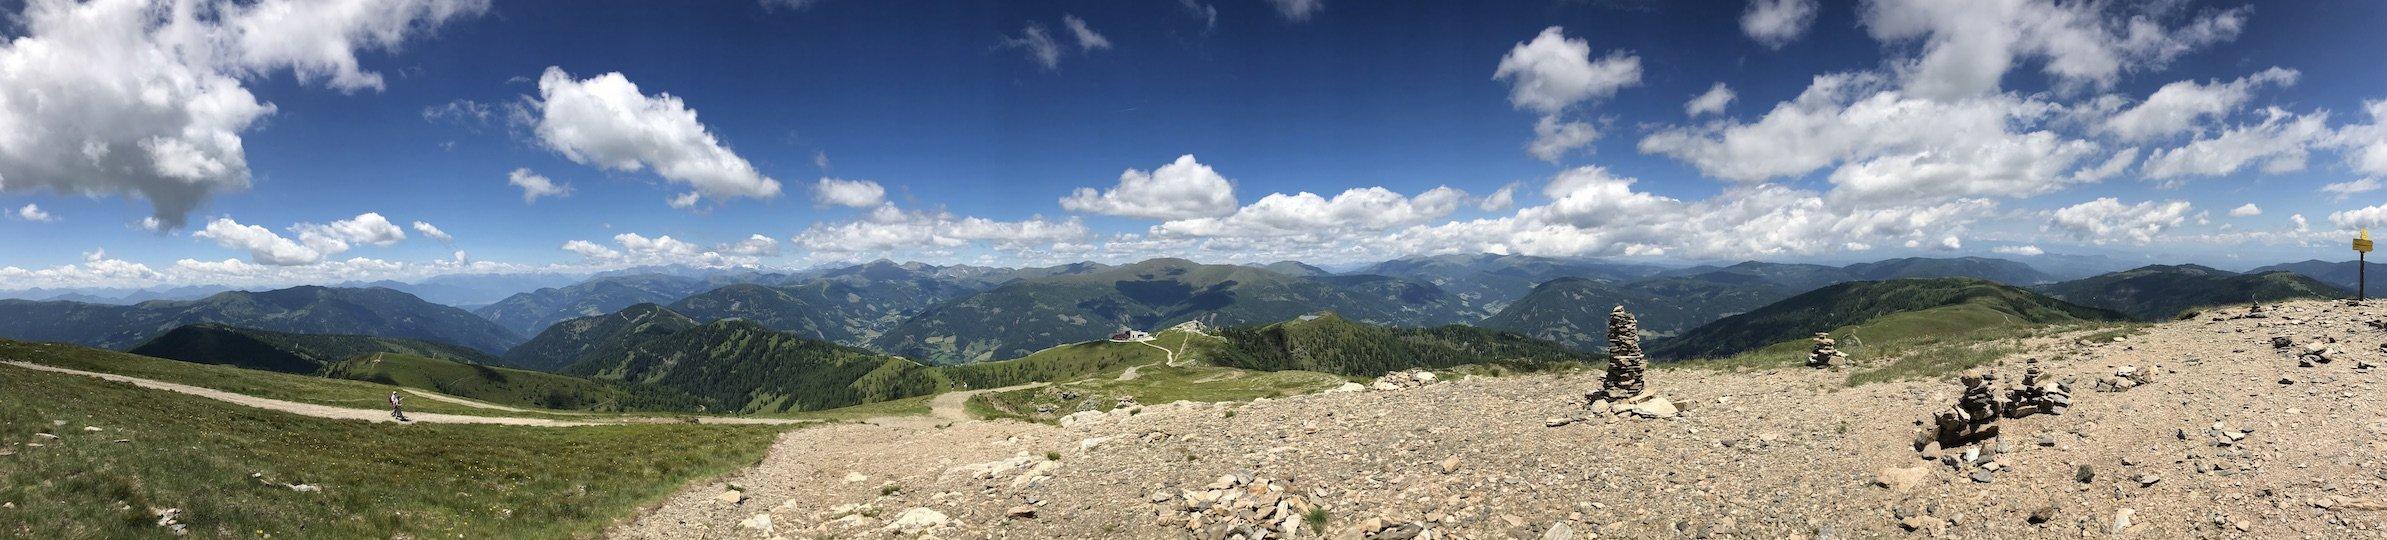 Panorama am Gipfel Kaiserburg